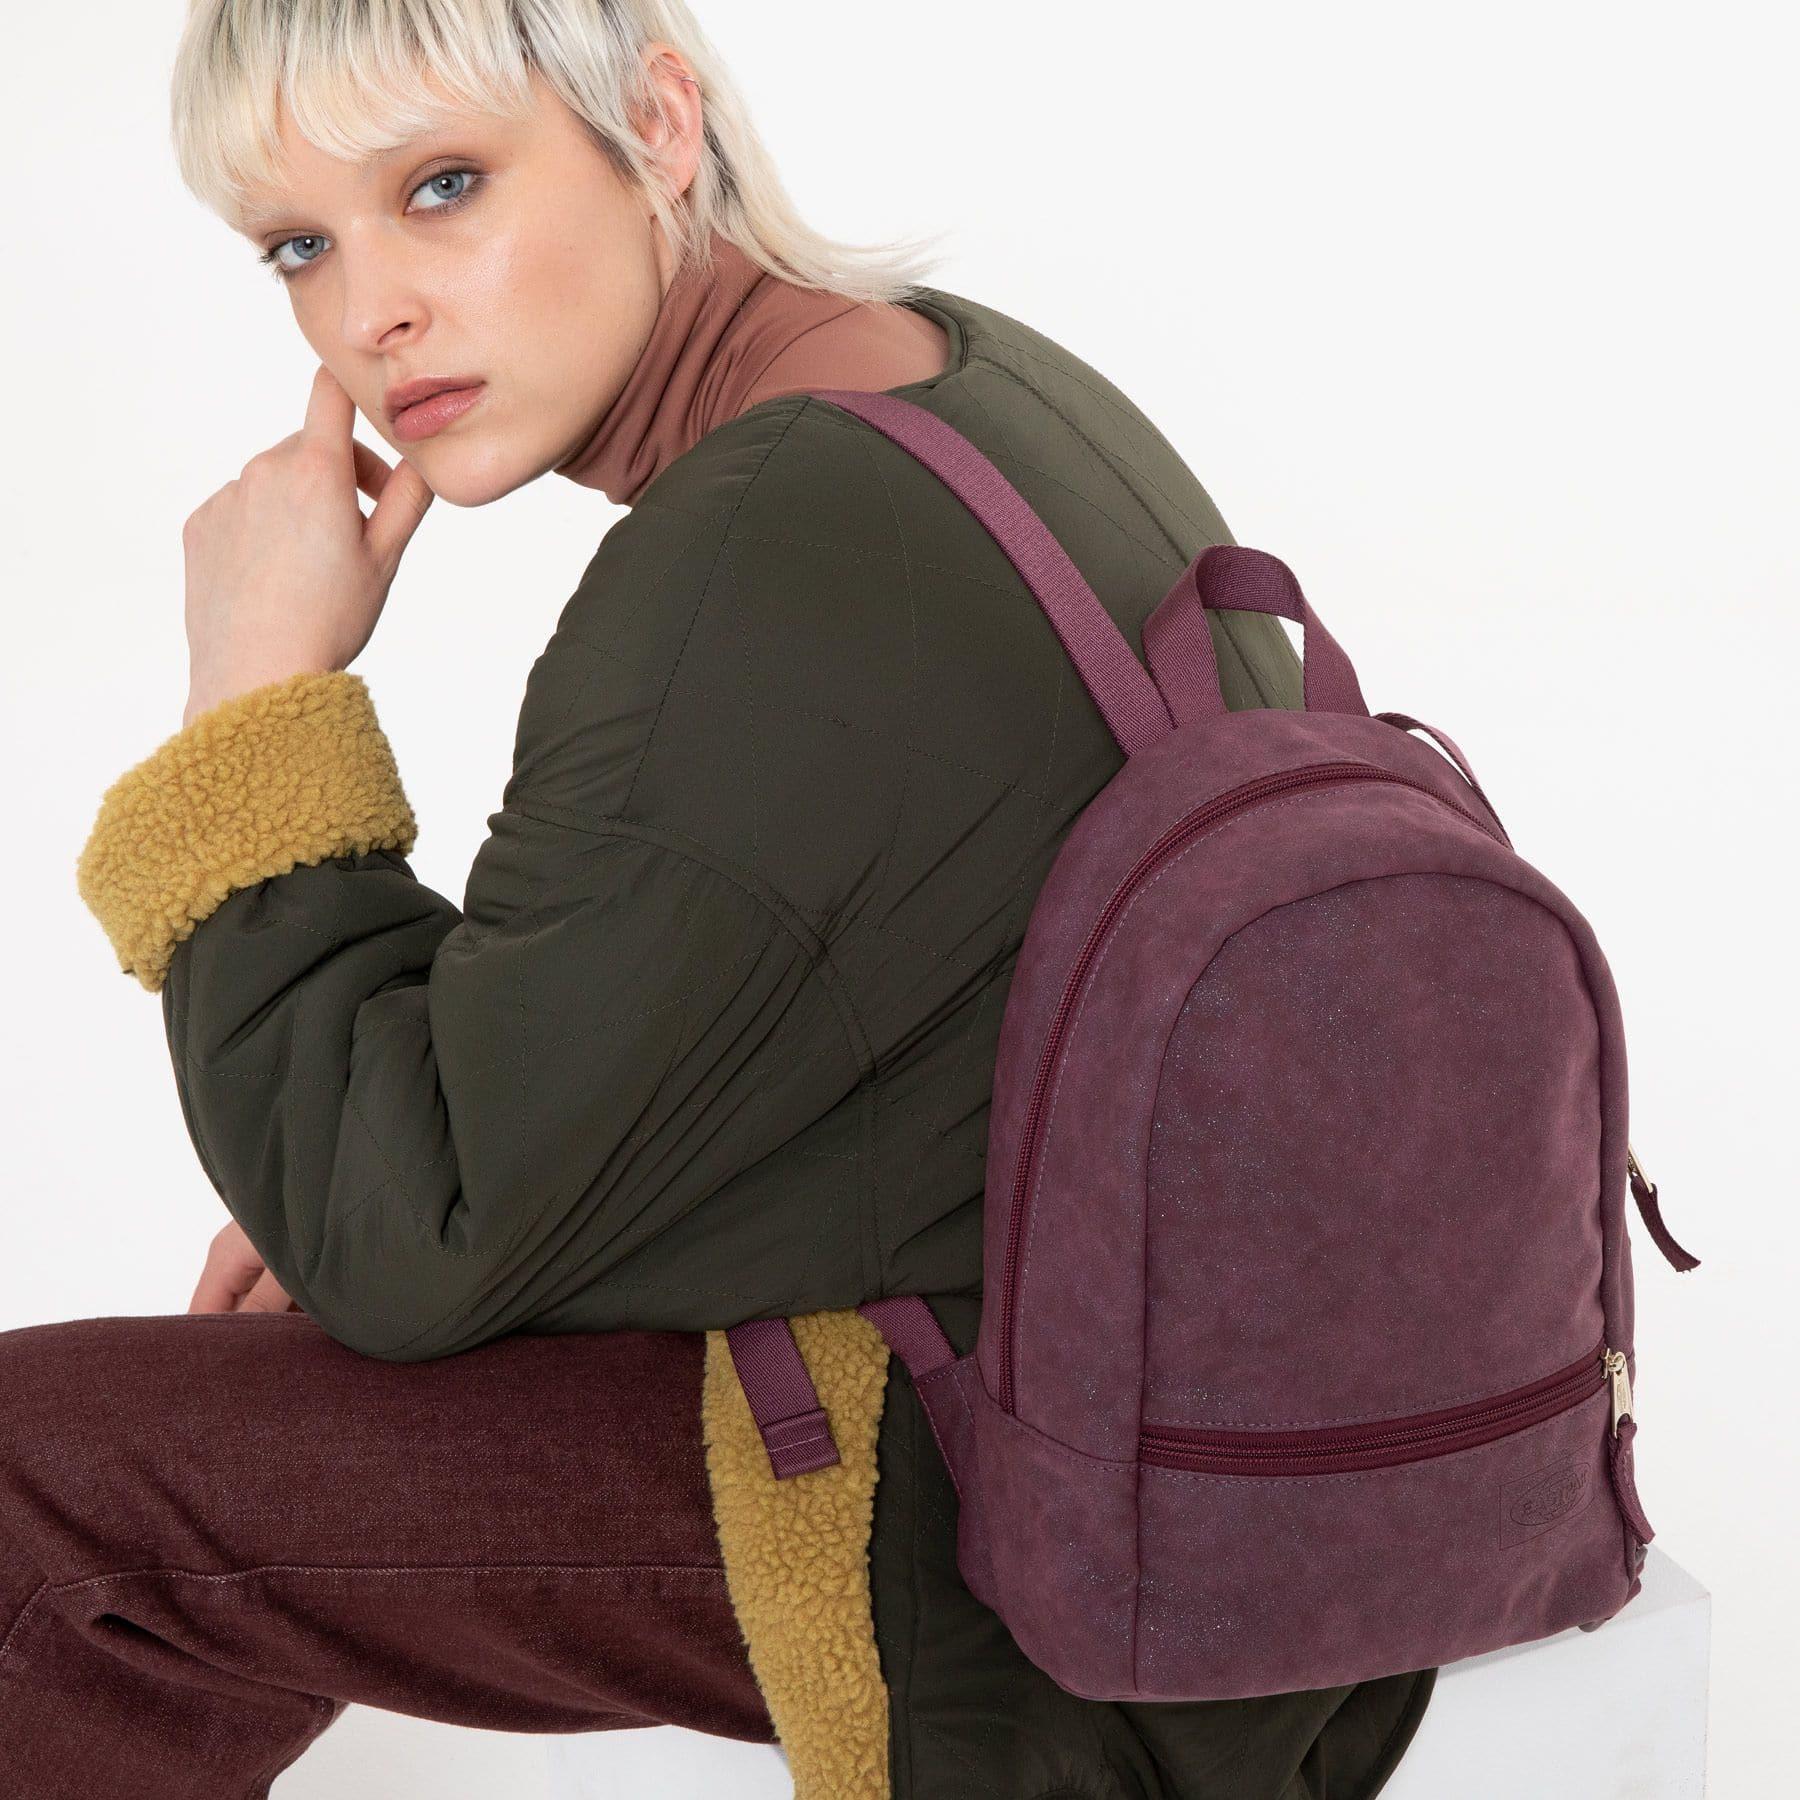 Eastpak Lucia Super Fashion Backpack Purple-185011